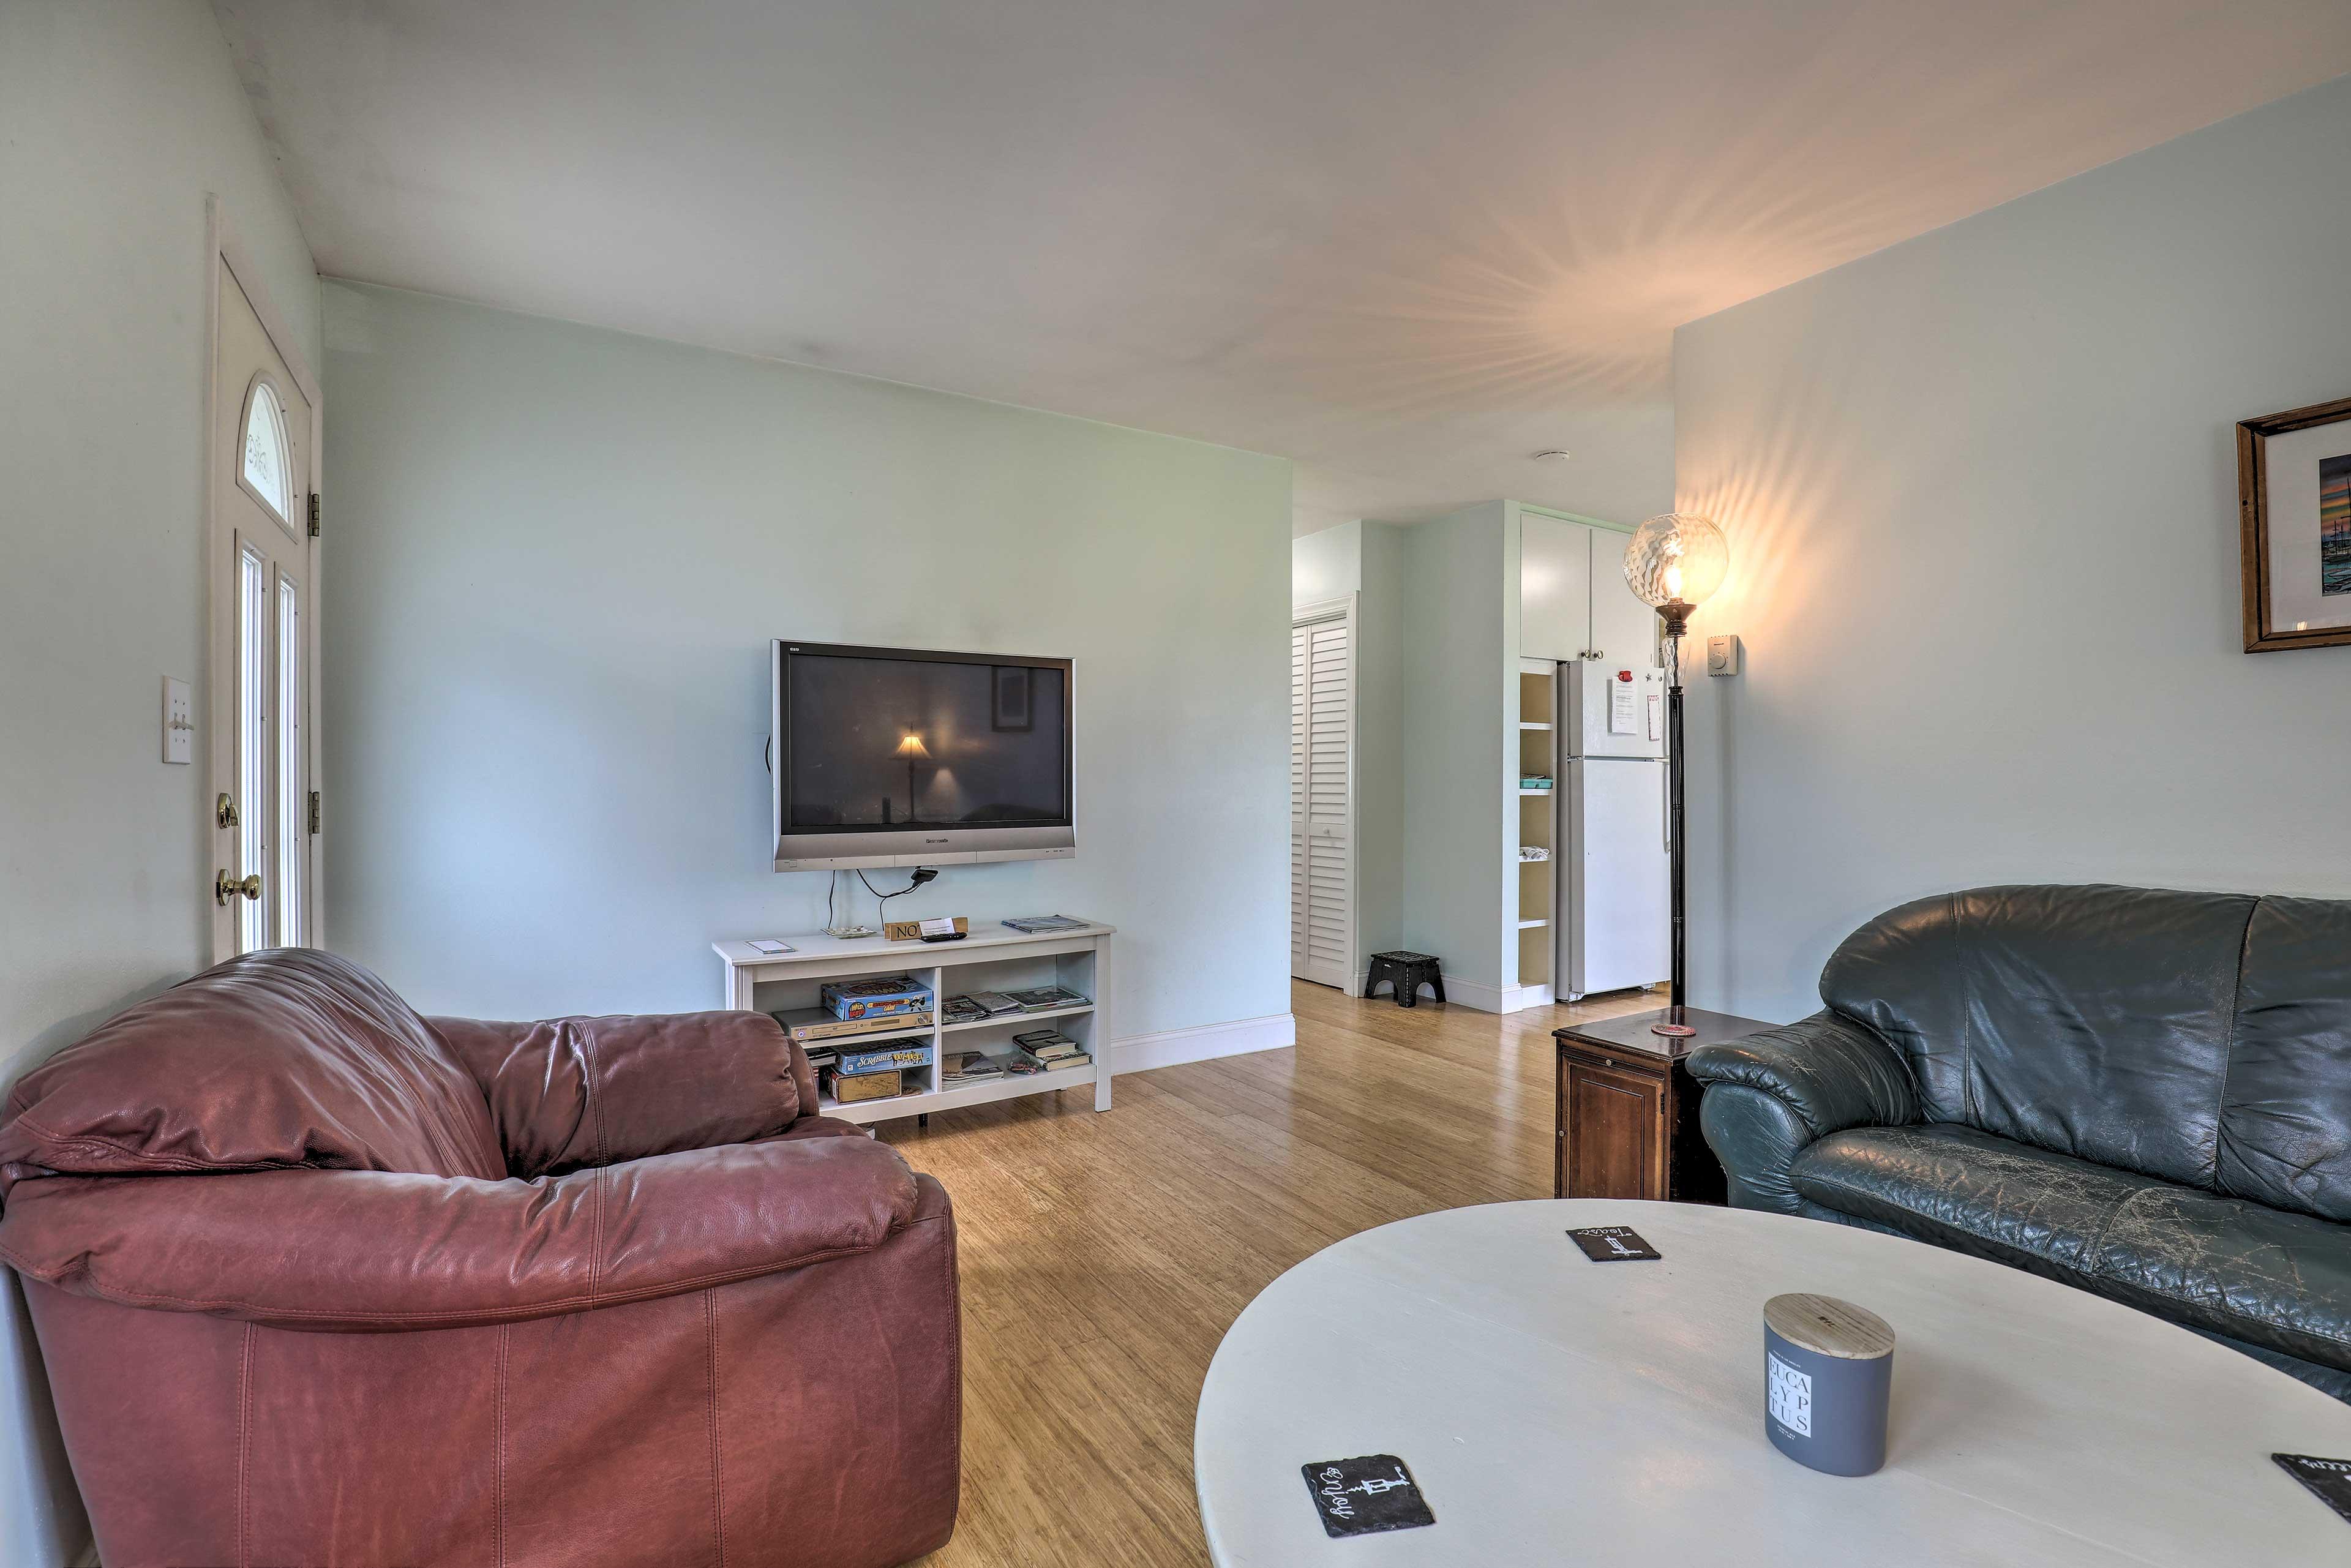 Living Room | TV w/ DIRECTV